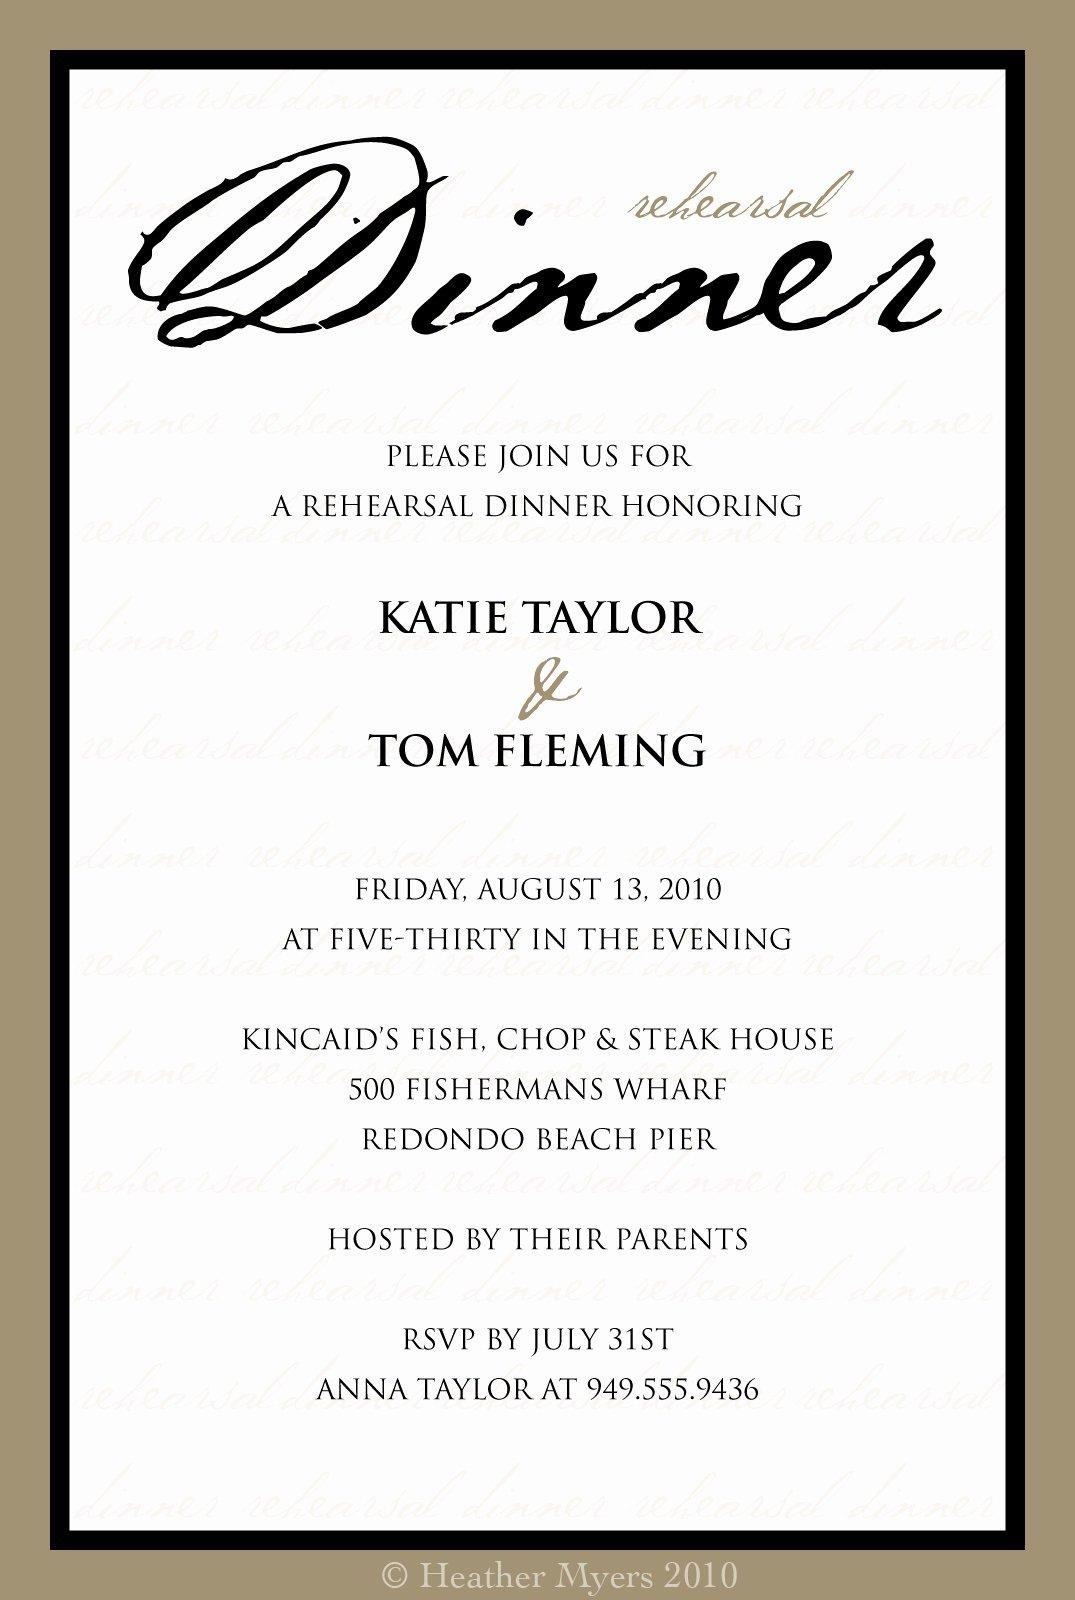 10 Best Of Dinner Invitation Template formal